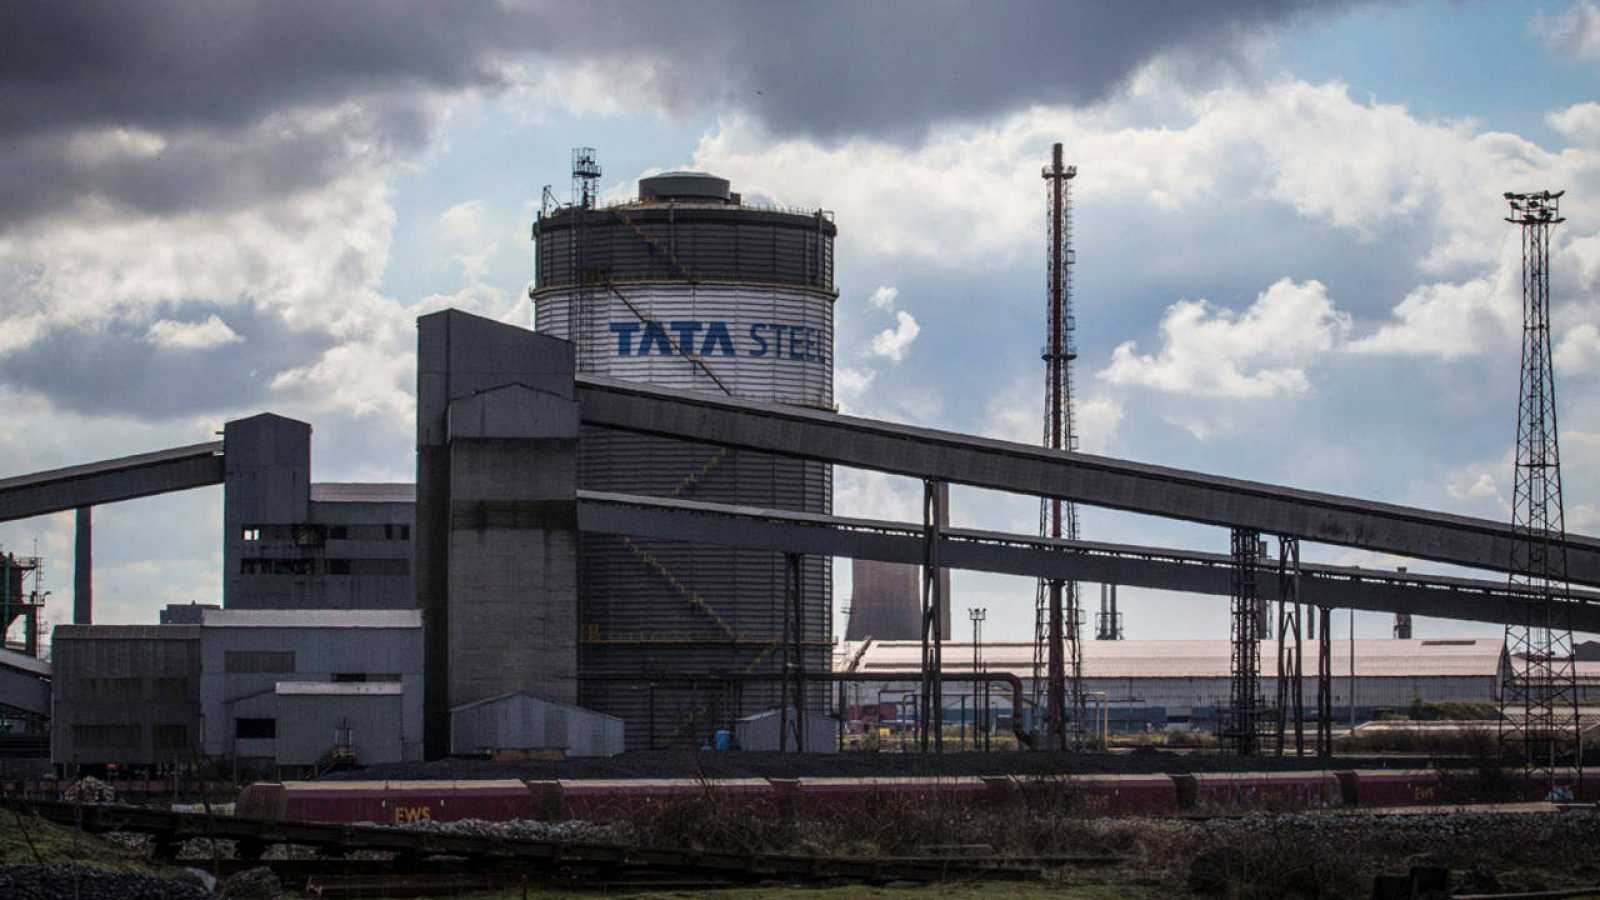 Planta de Tata Steel en Scunthorpe, noreste de Inglaterra